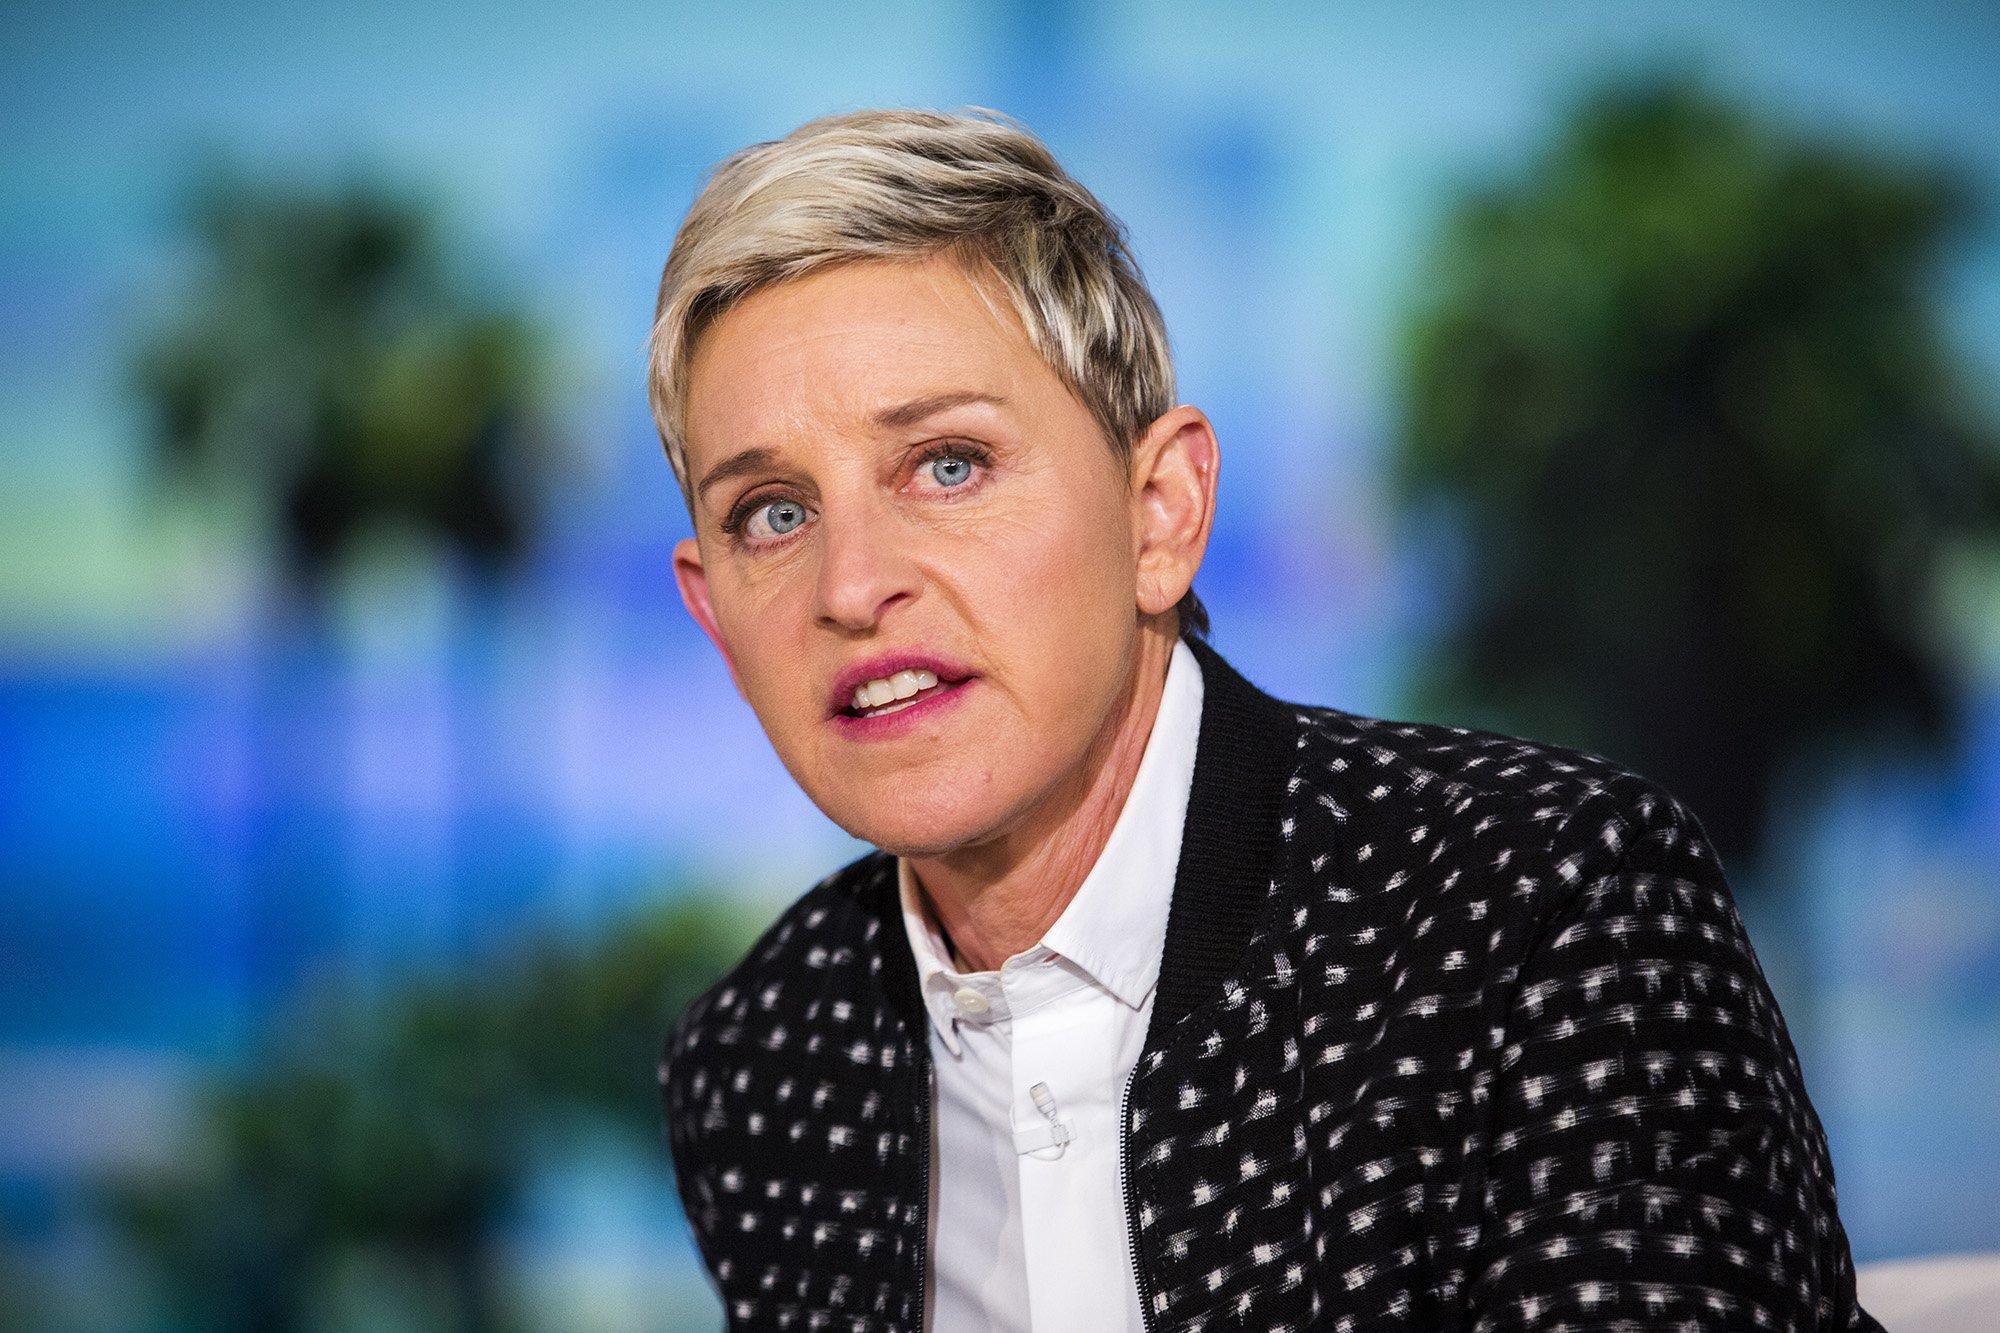 Ellen DeGeneres confirms she is ending talk show